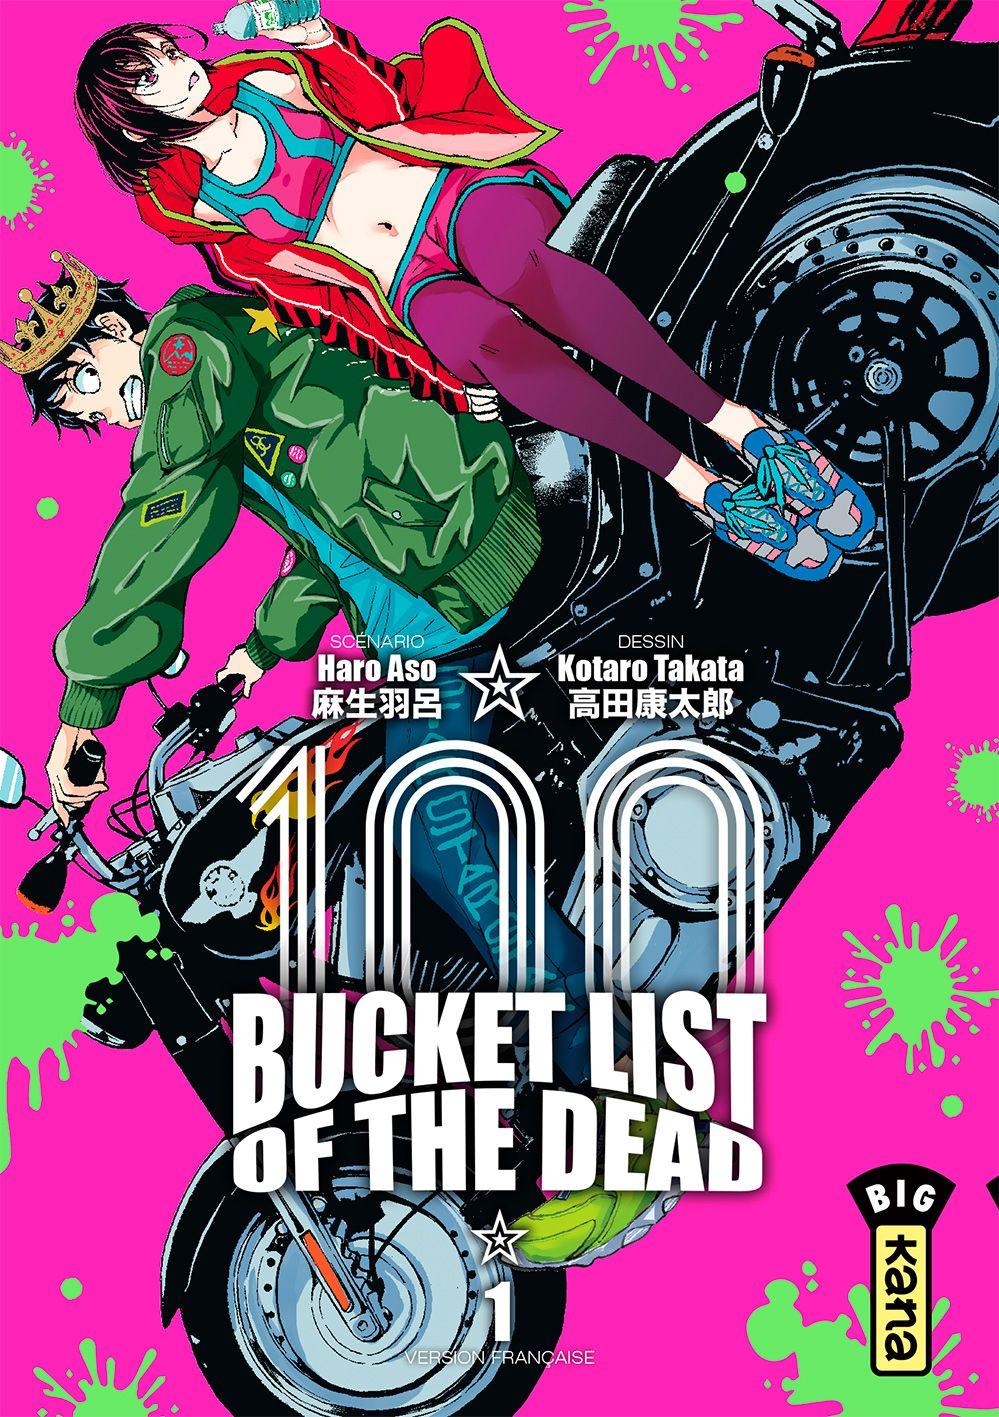 Sortie Manga au Québec JUIN 2021 Bucket-list-of-the-dead-1-kana